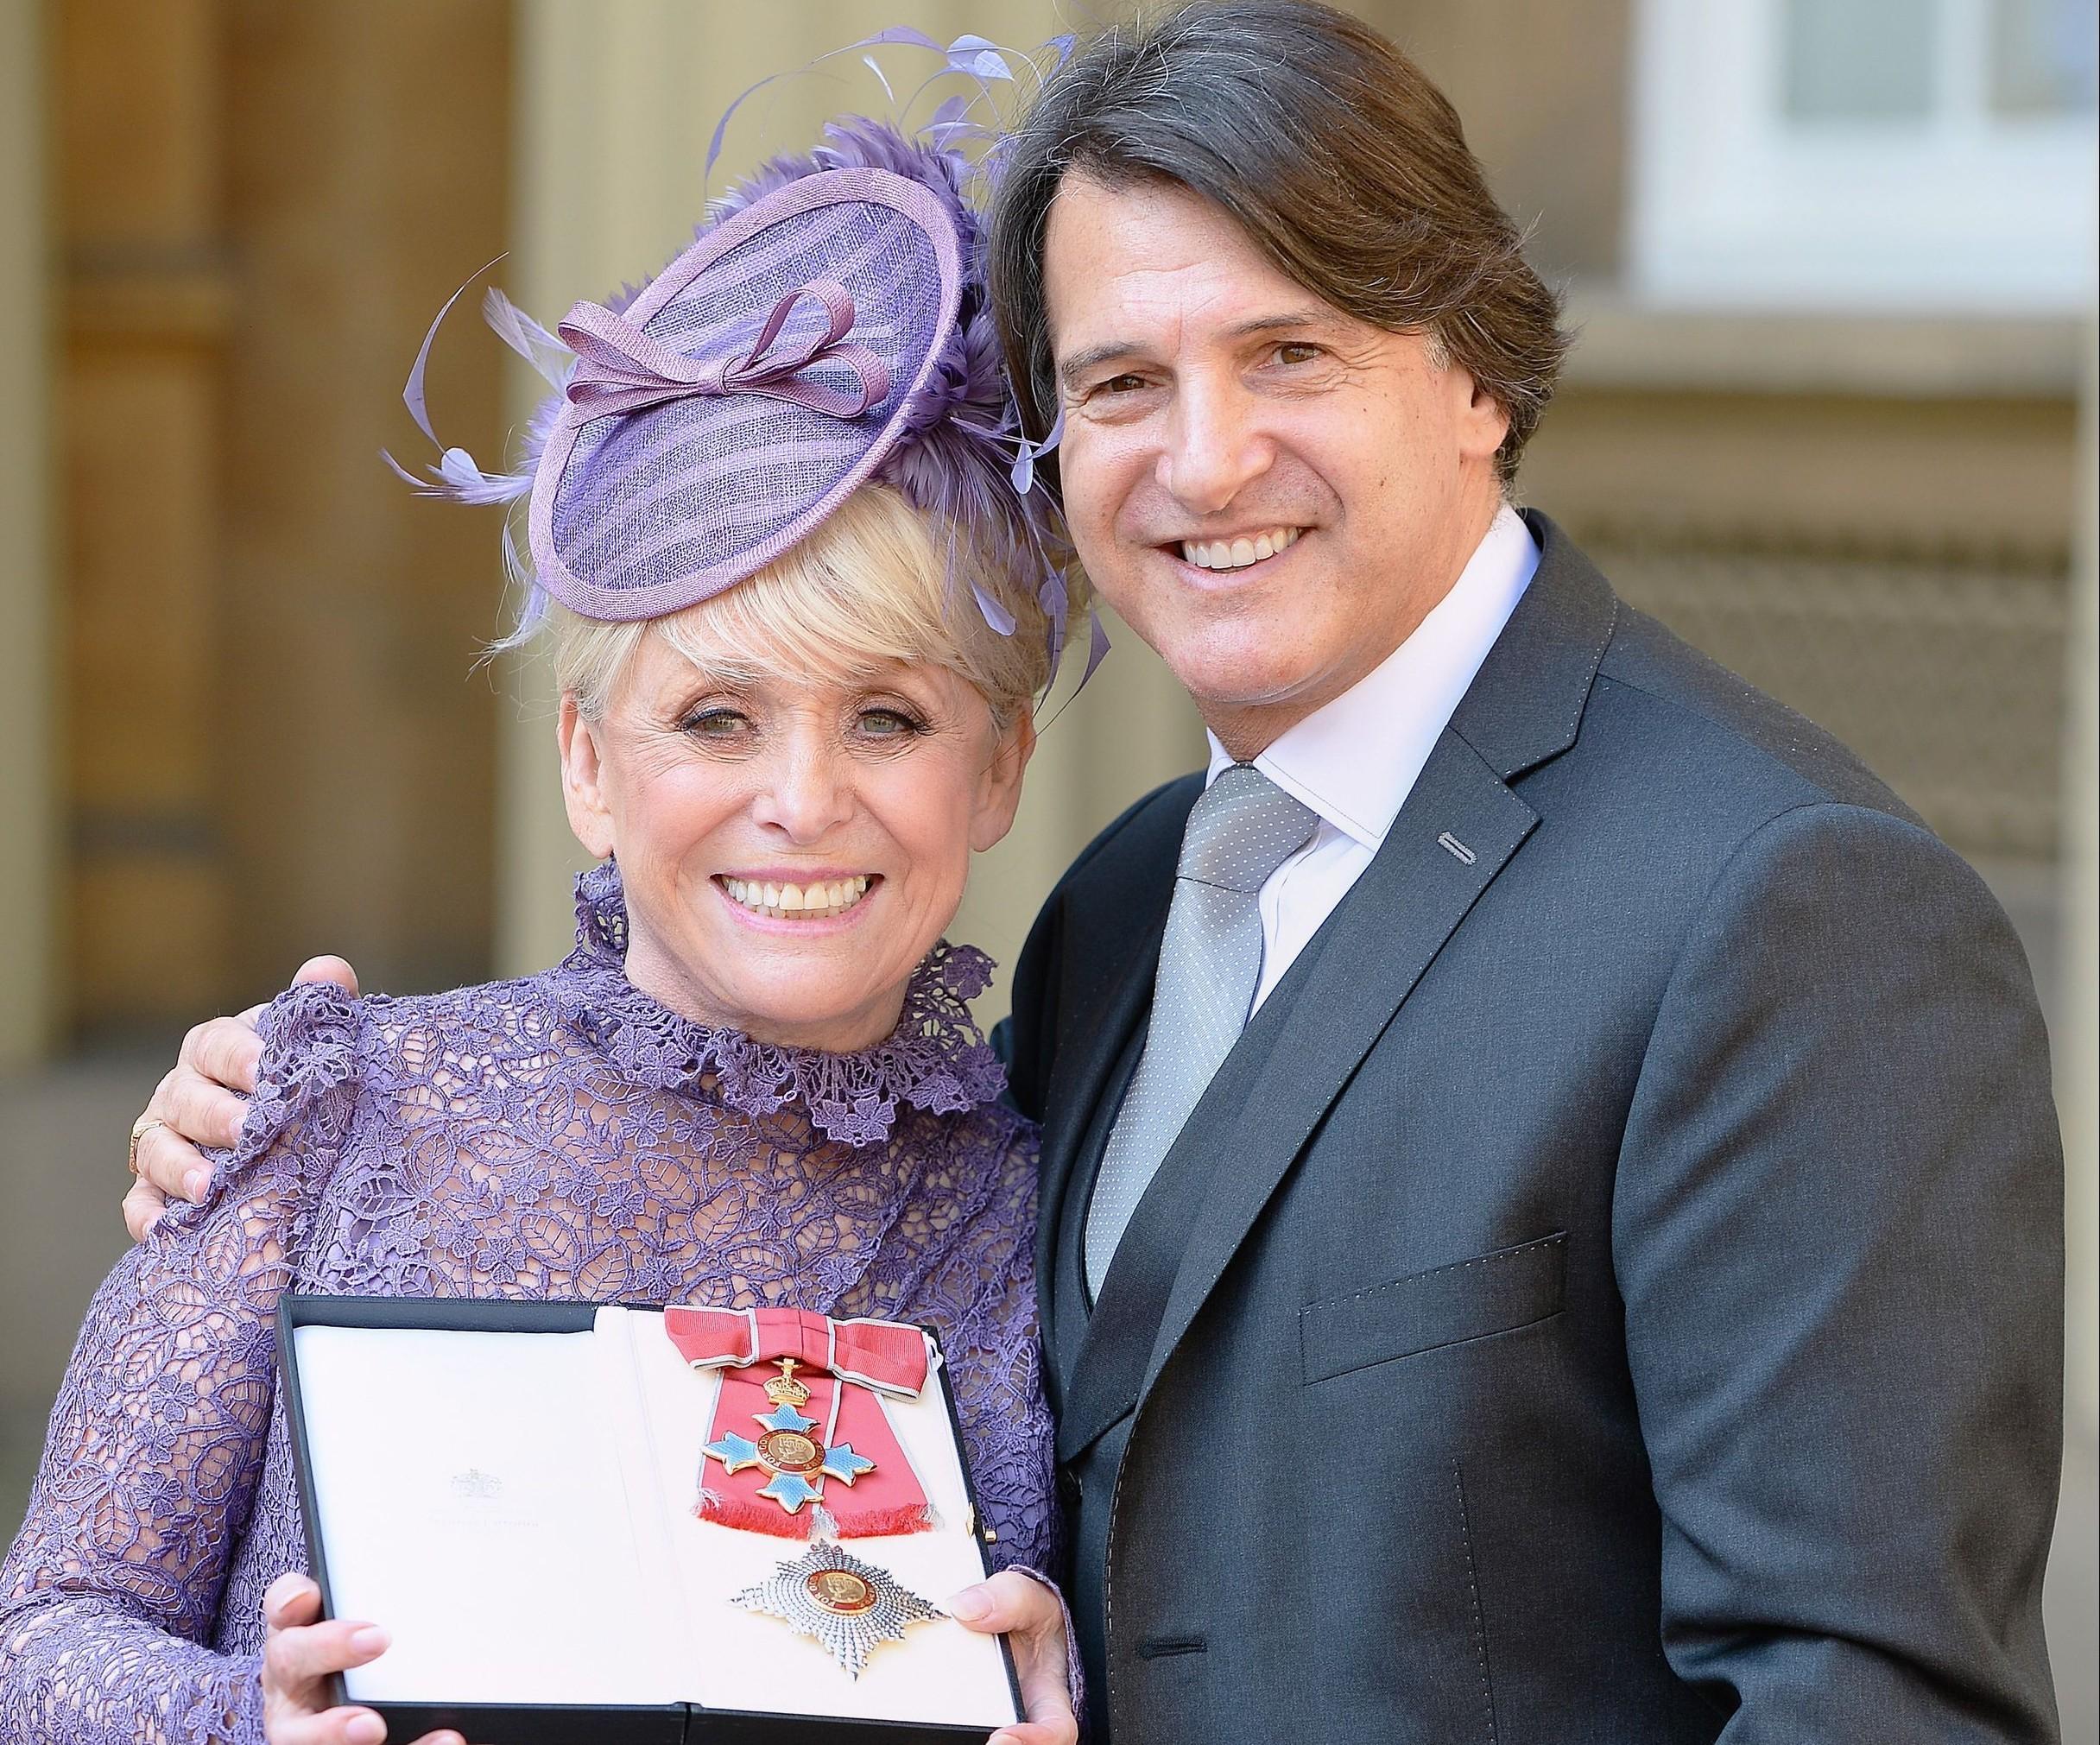 Ex-EastEnder Emma Barton uses Barbara Windsor as inspiration